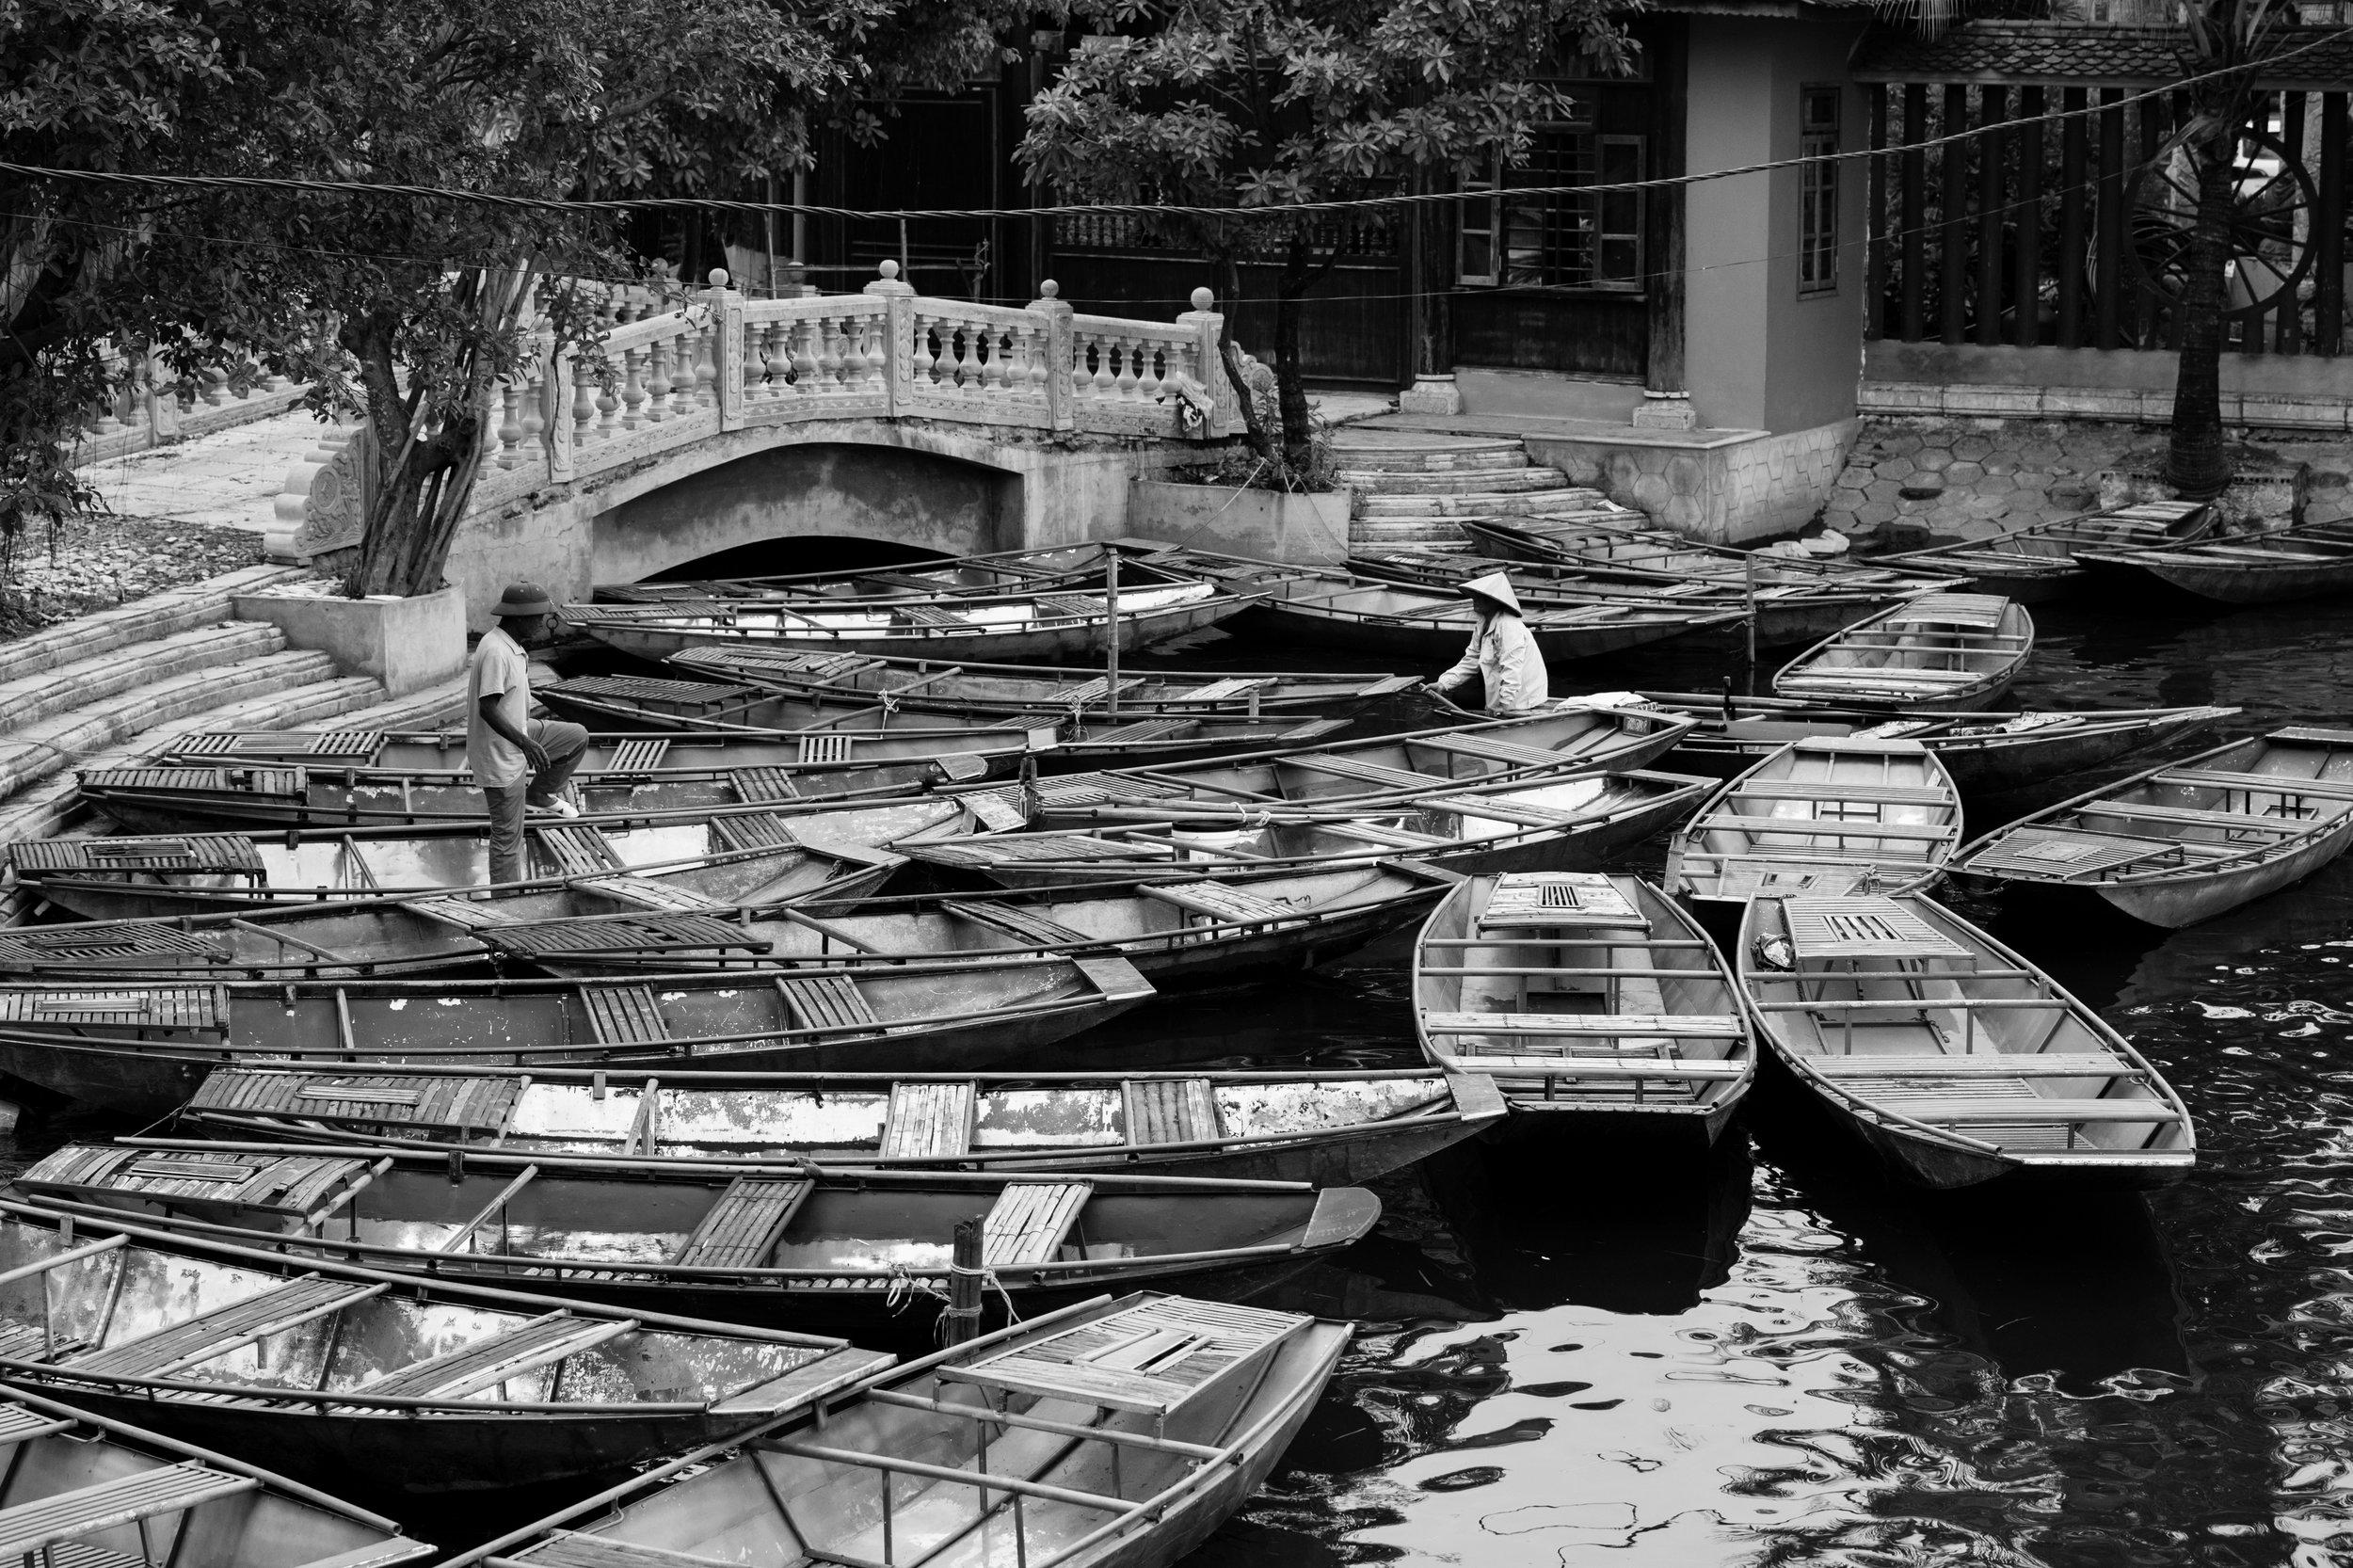 Boats_Ninh Binh_-1.jpg